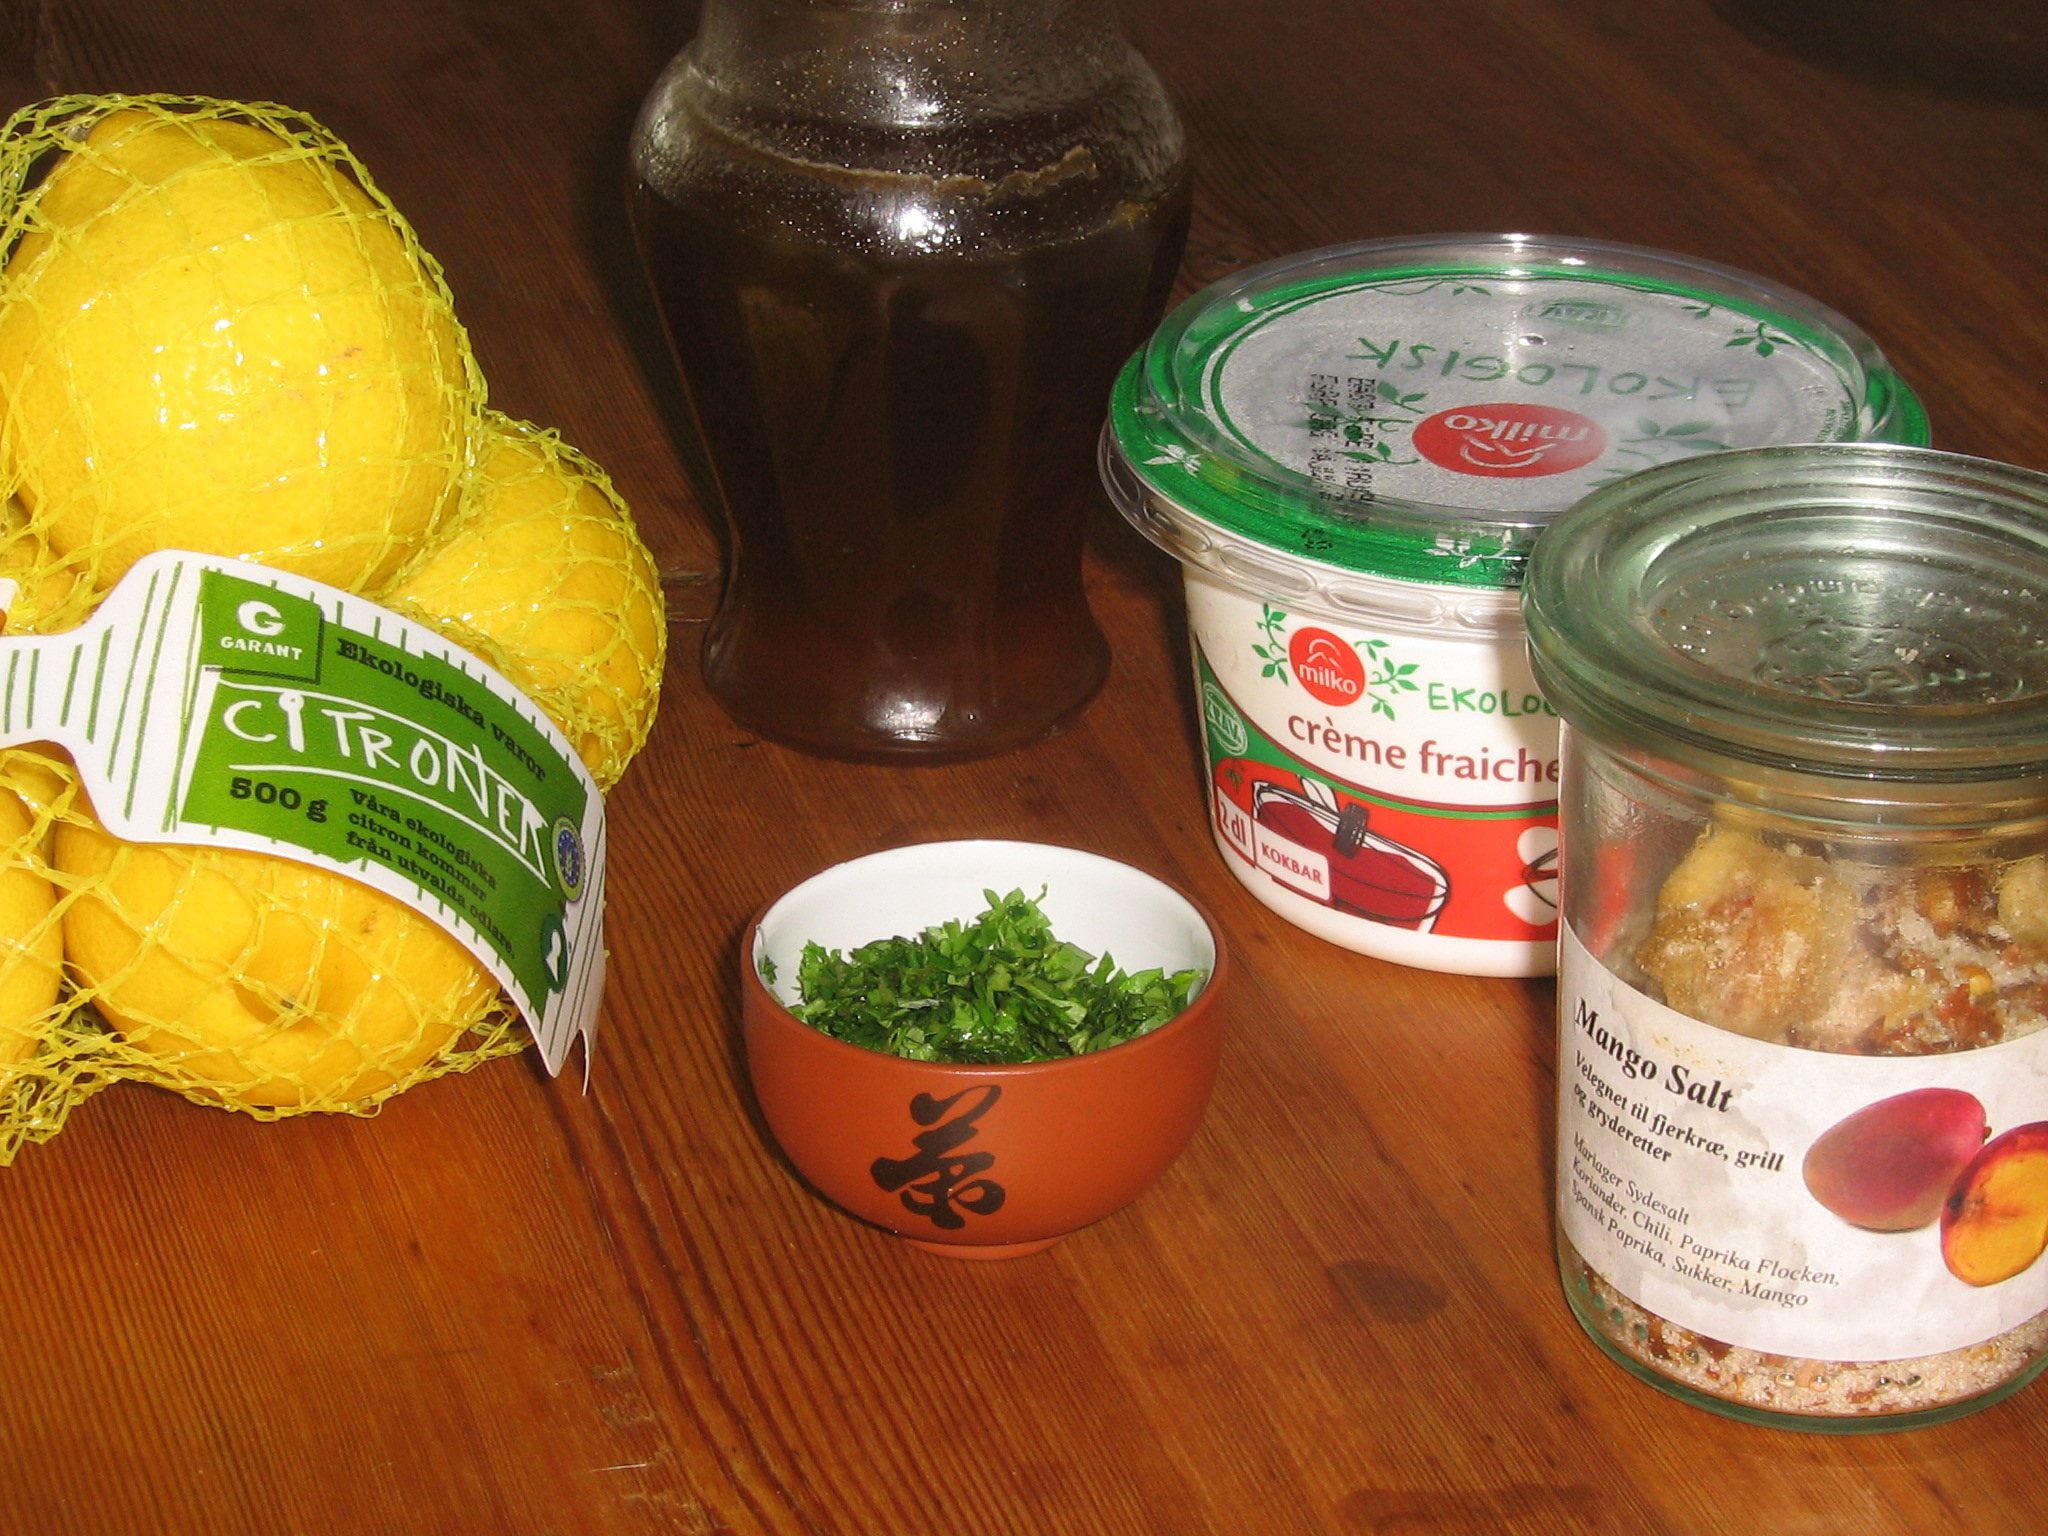 Ekologiska Citroner, Mörk Honung, Ekologisk Crème Fraiche, Mangosalt från Mariager Sydesalt